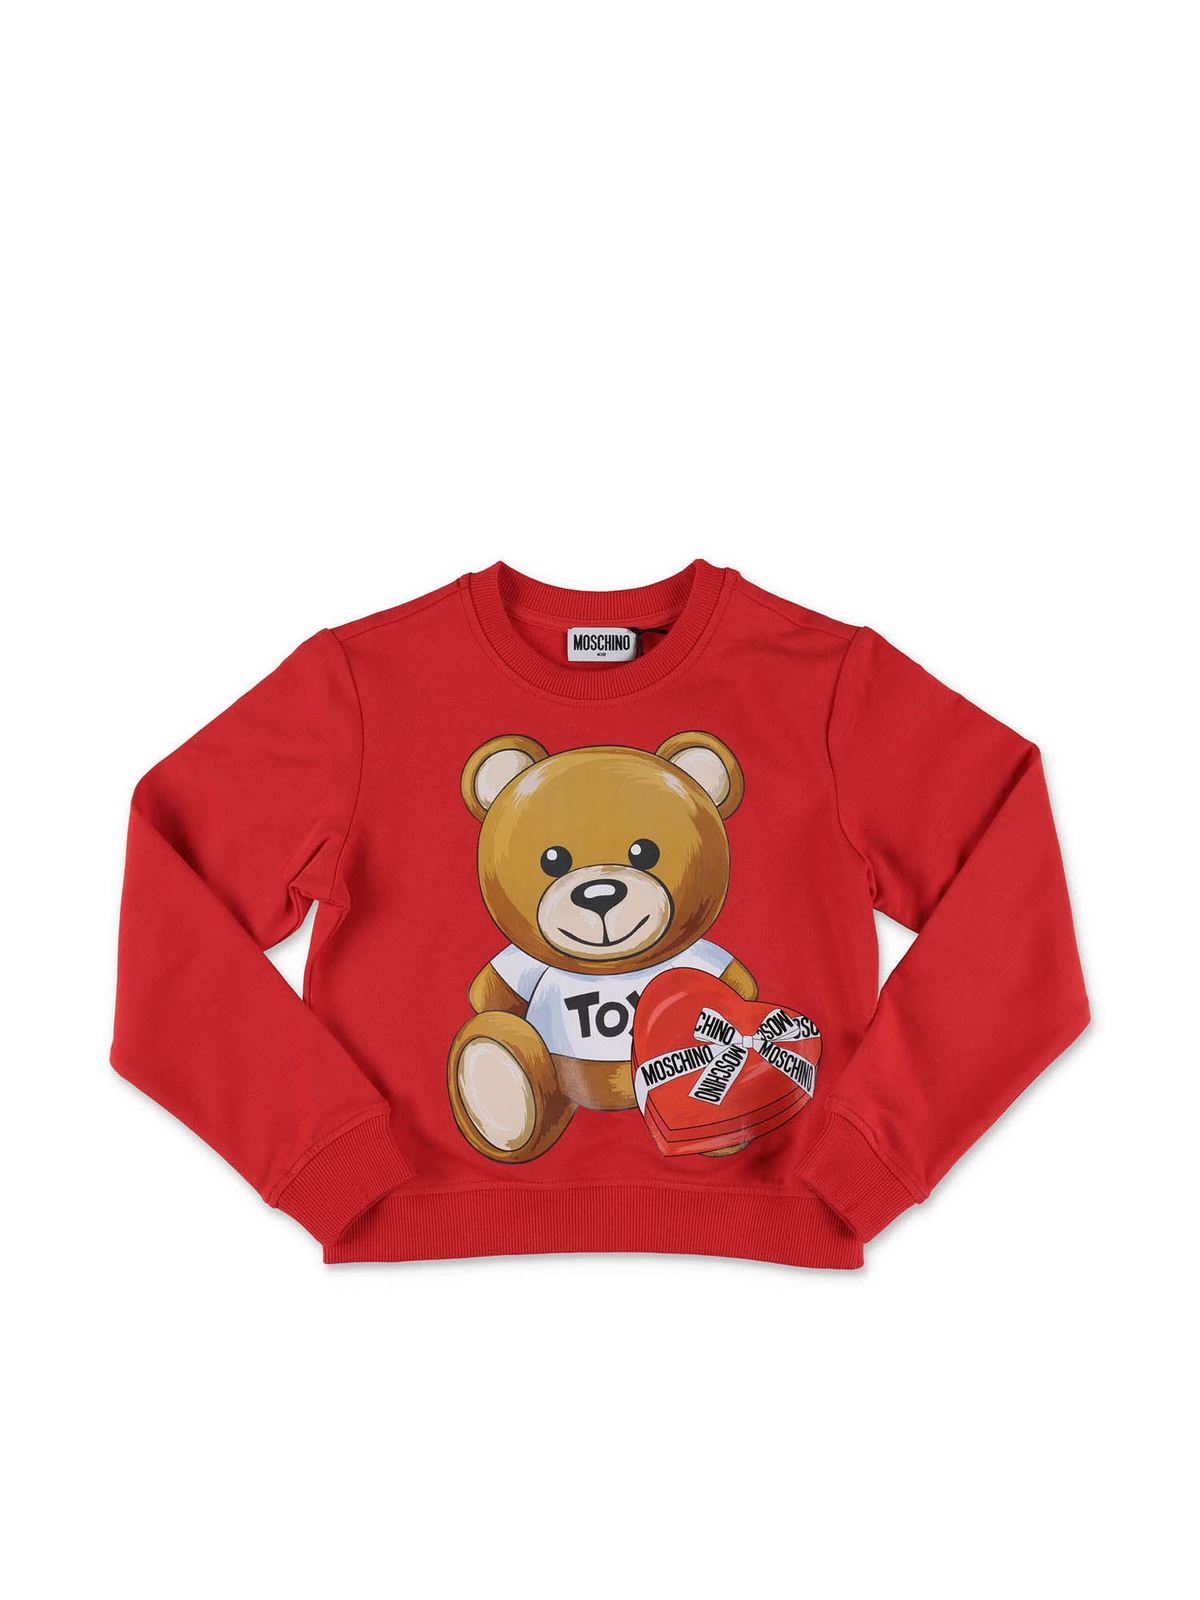 MOSCHINO RED TEDDY BEAR SWEATSHIRT